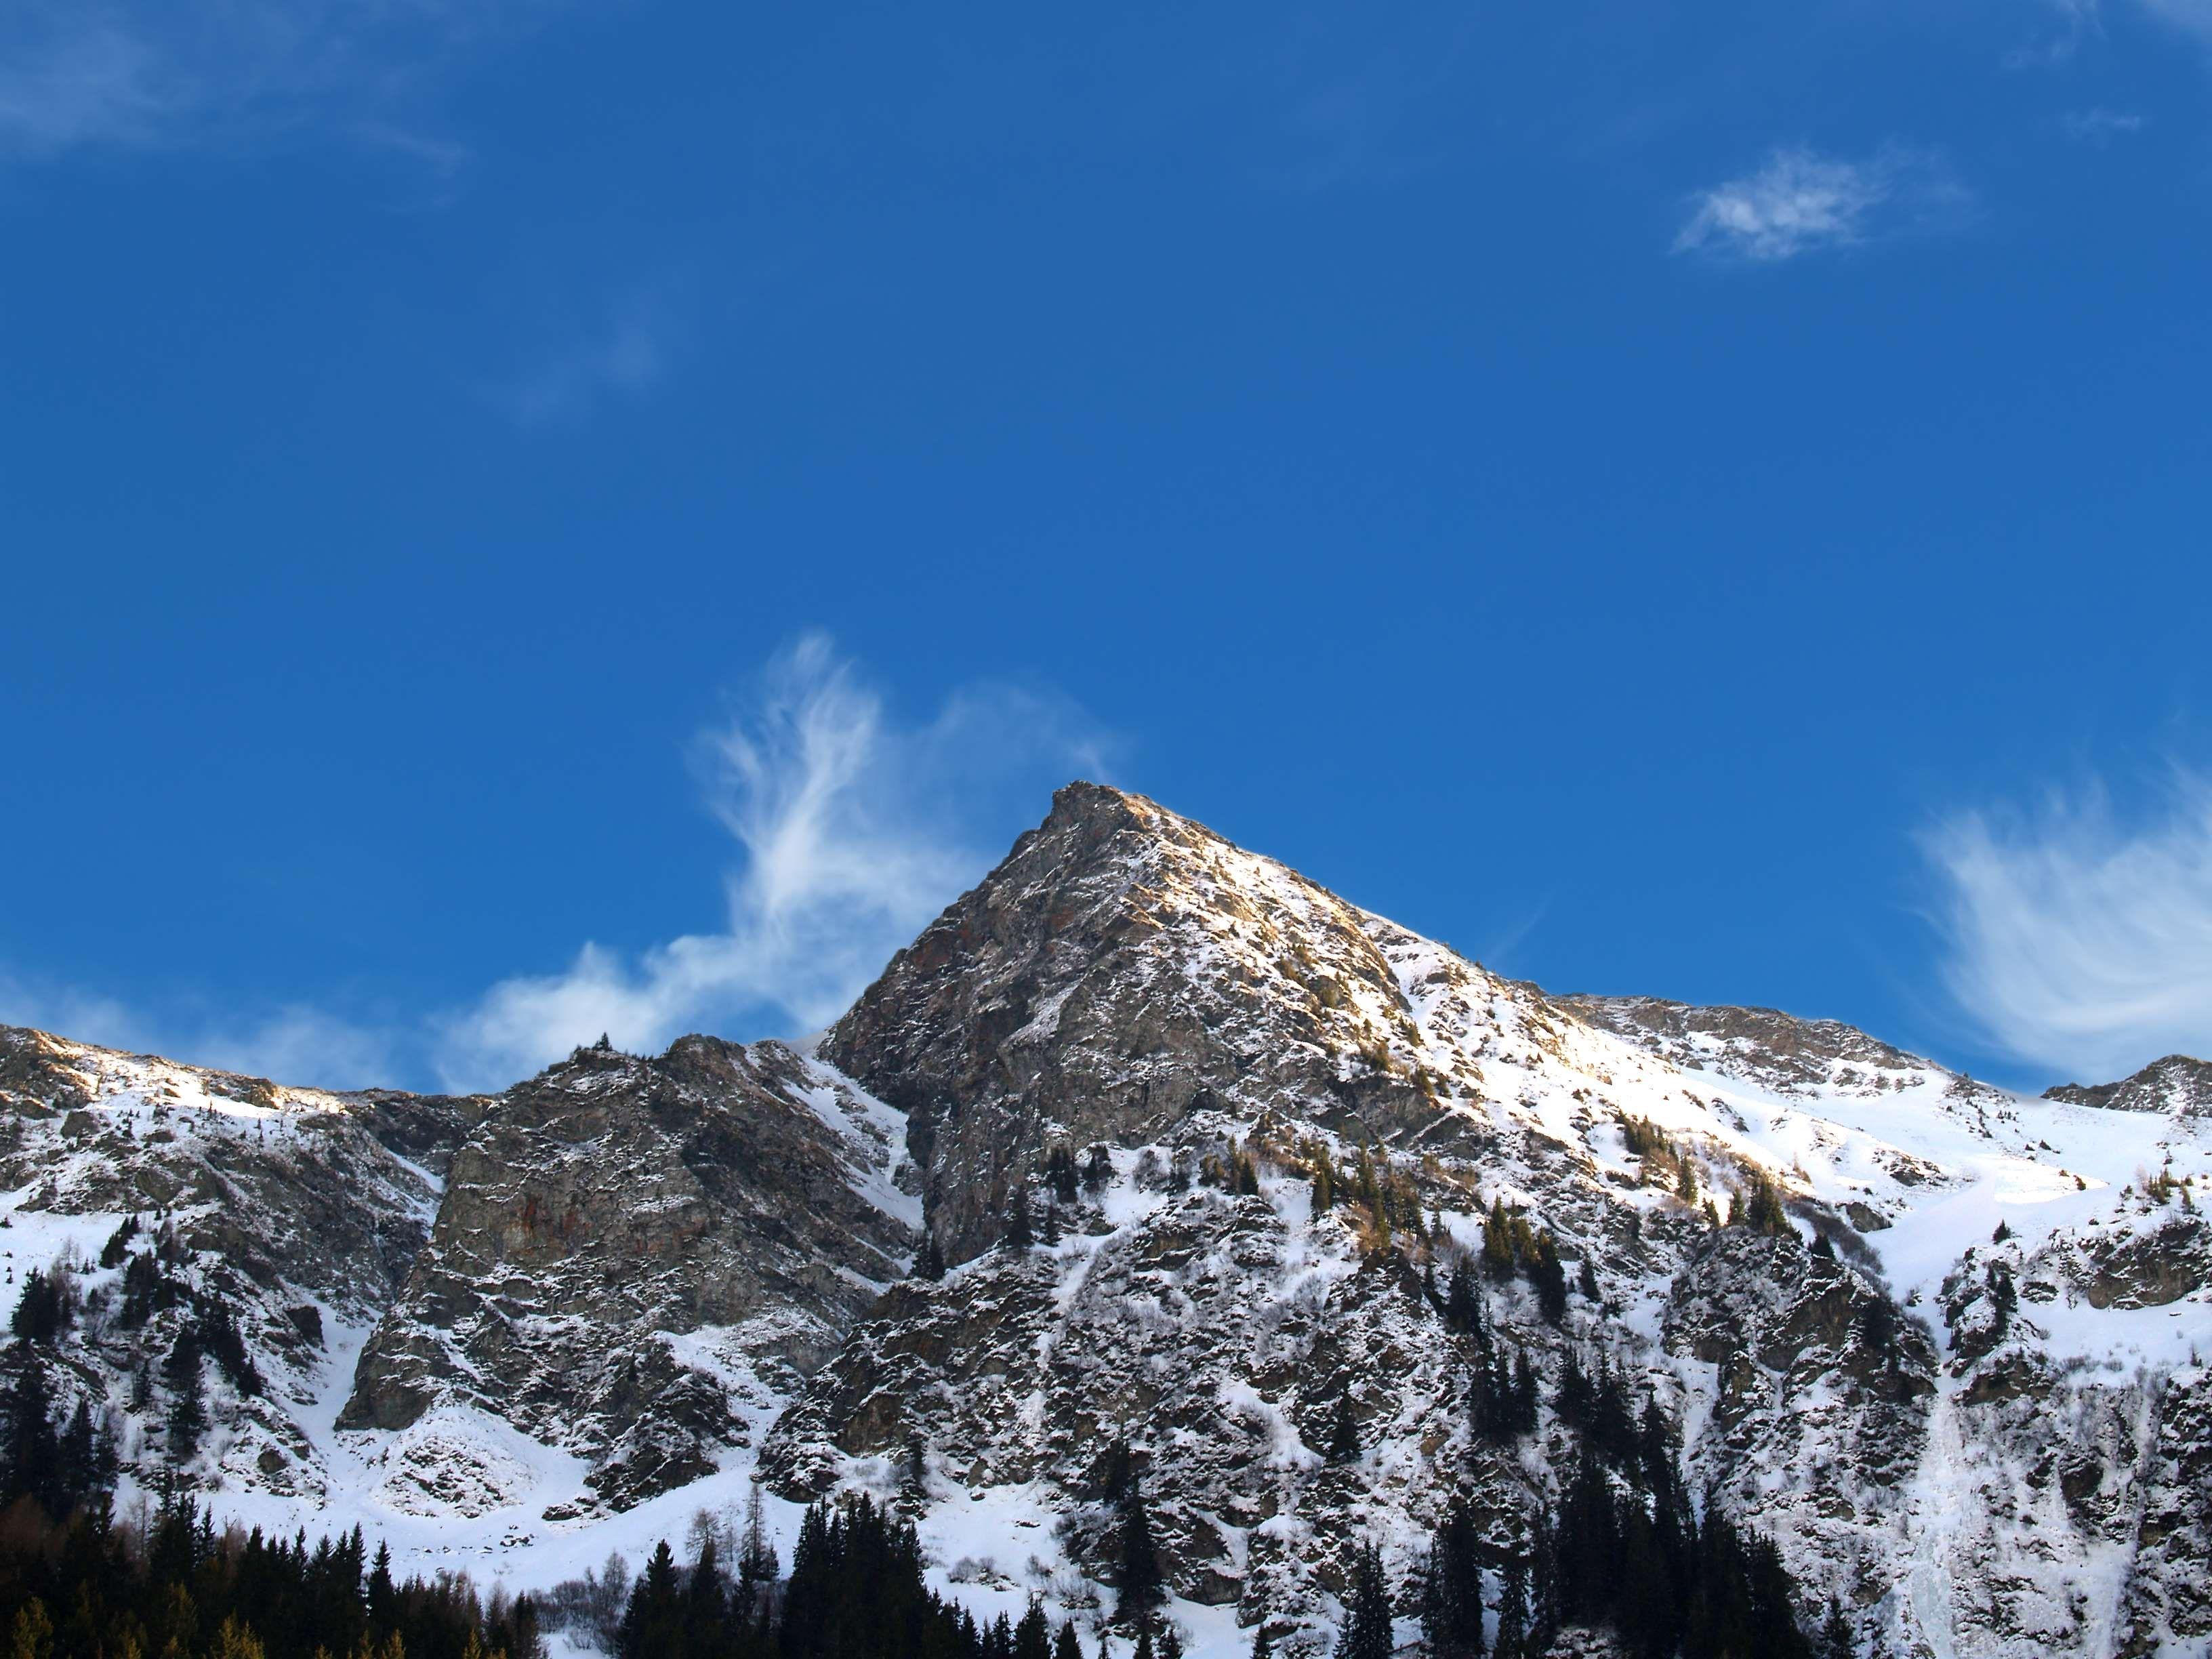 cloud desktop backgrounds grey mountain mountain top